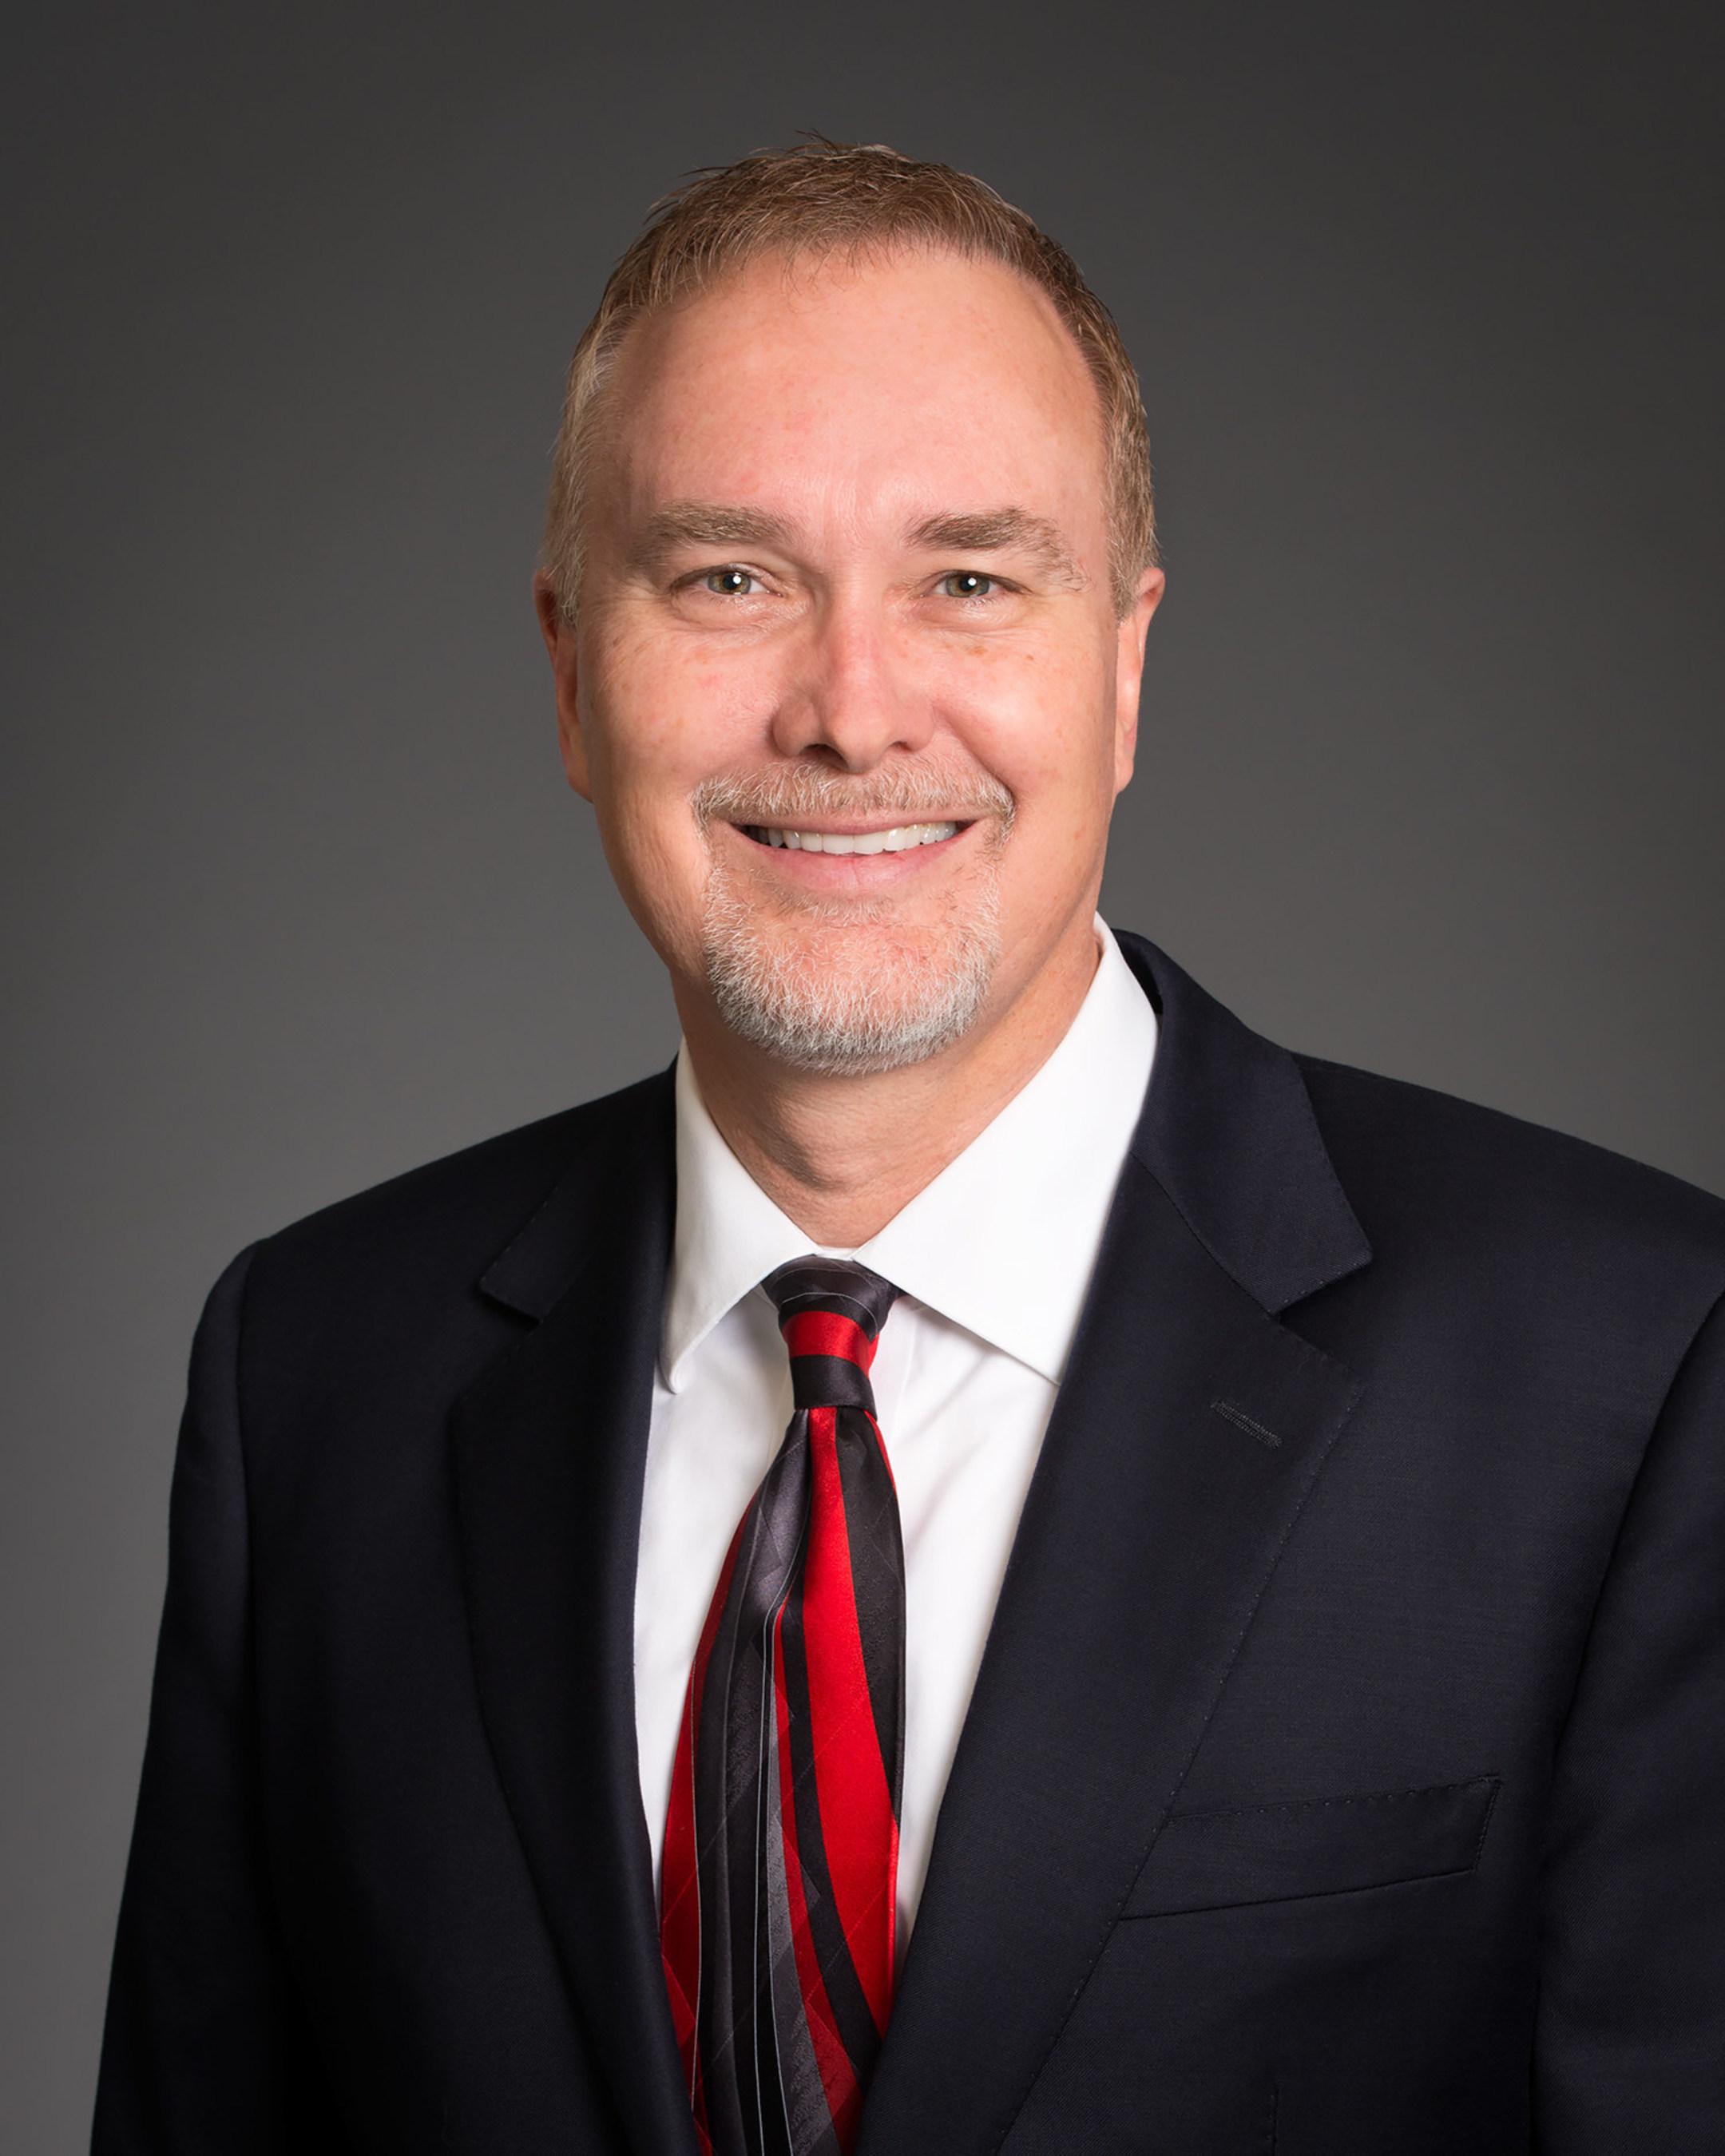 Richard Salmen, CFP(R) Elected 2017 Chair-Elect